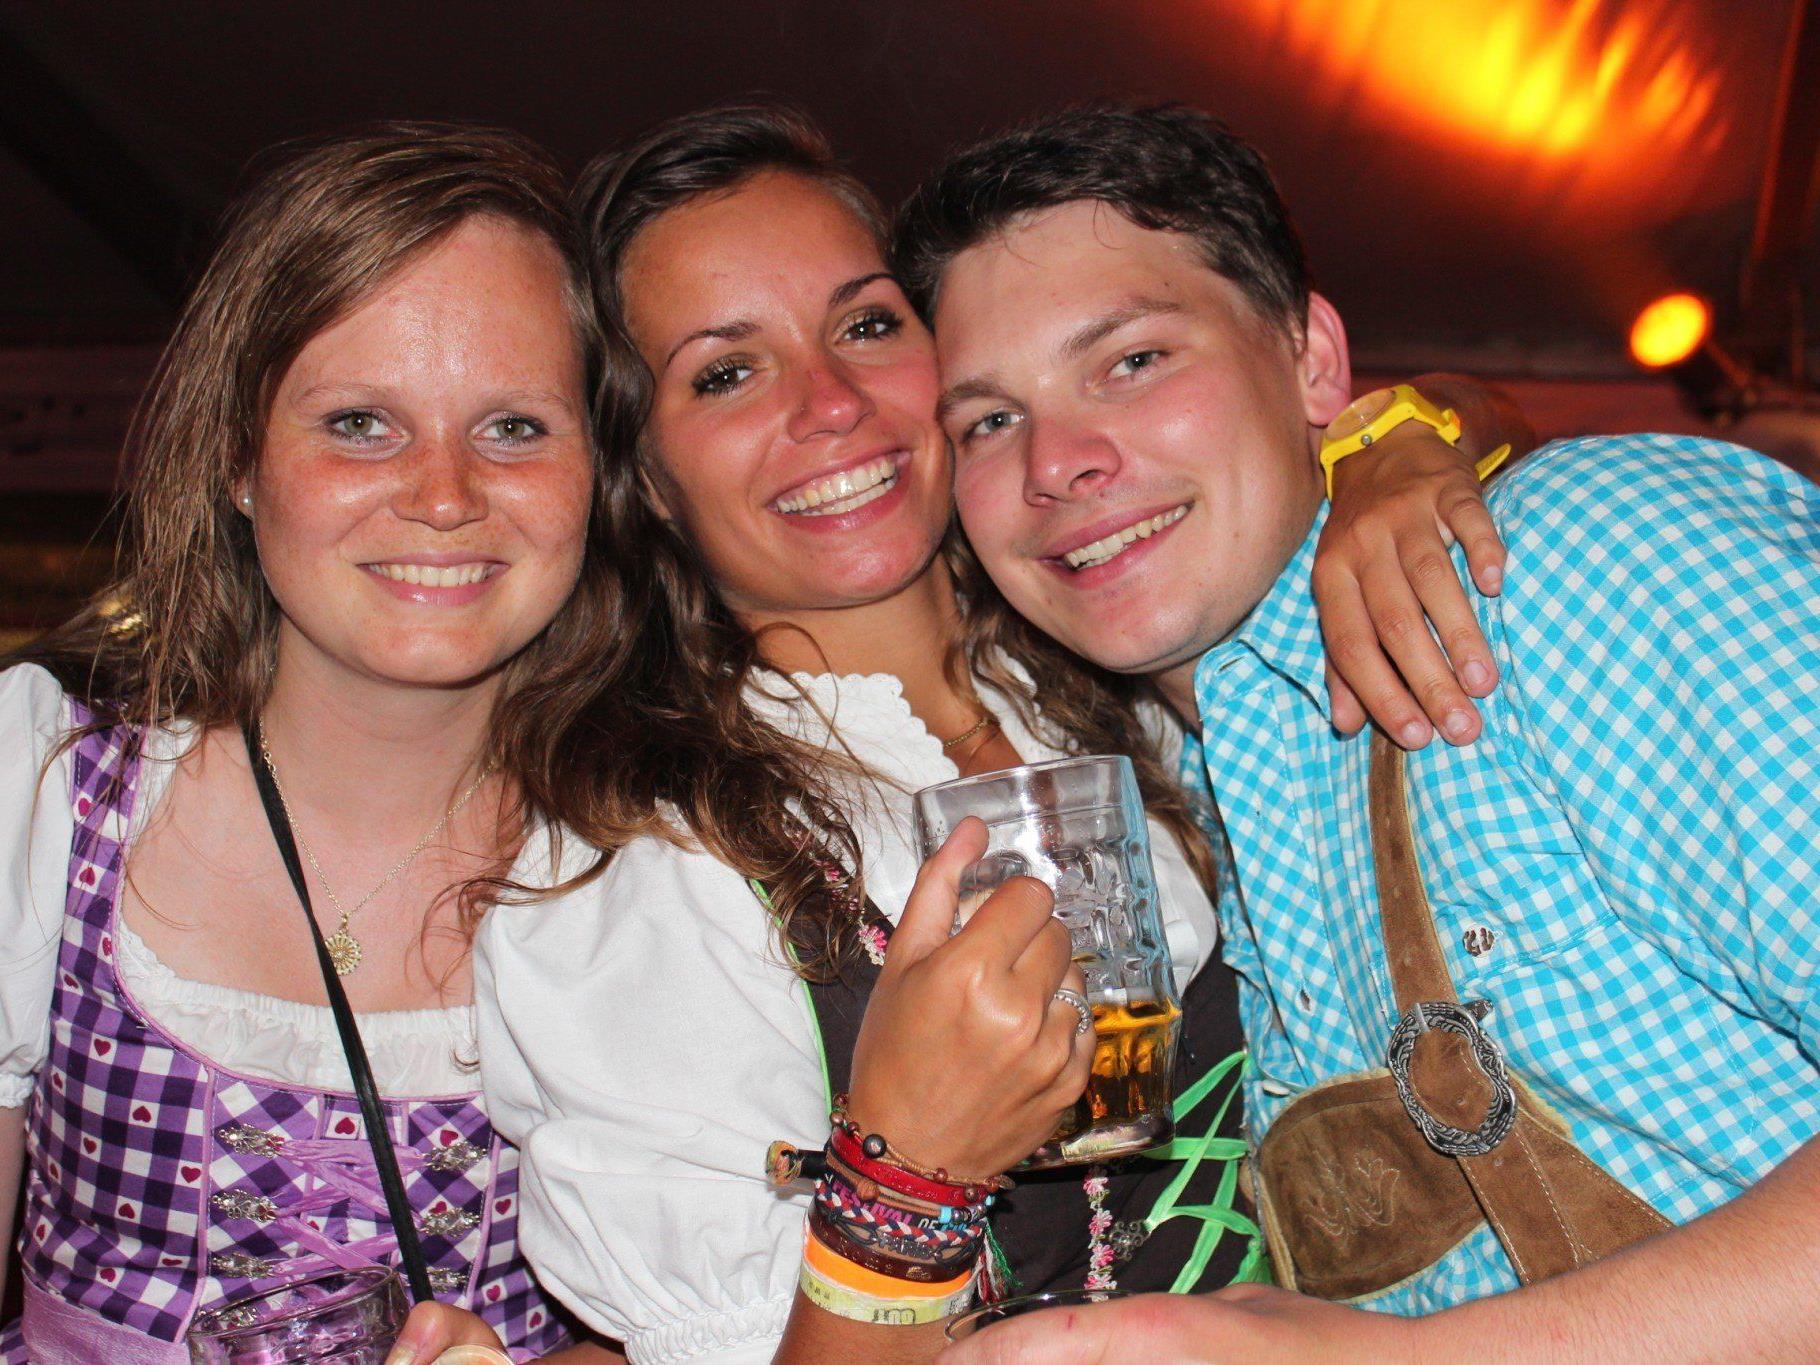 Super Party Freitag Nacht in Au.